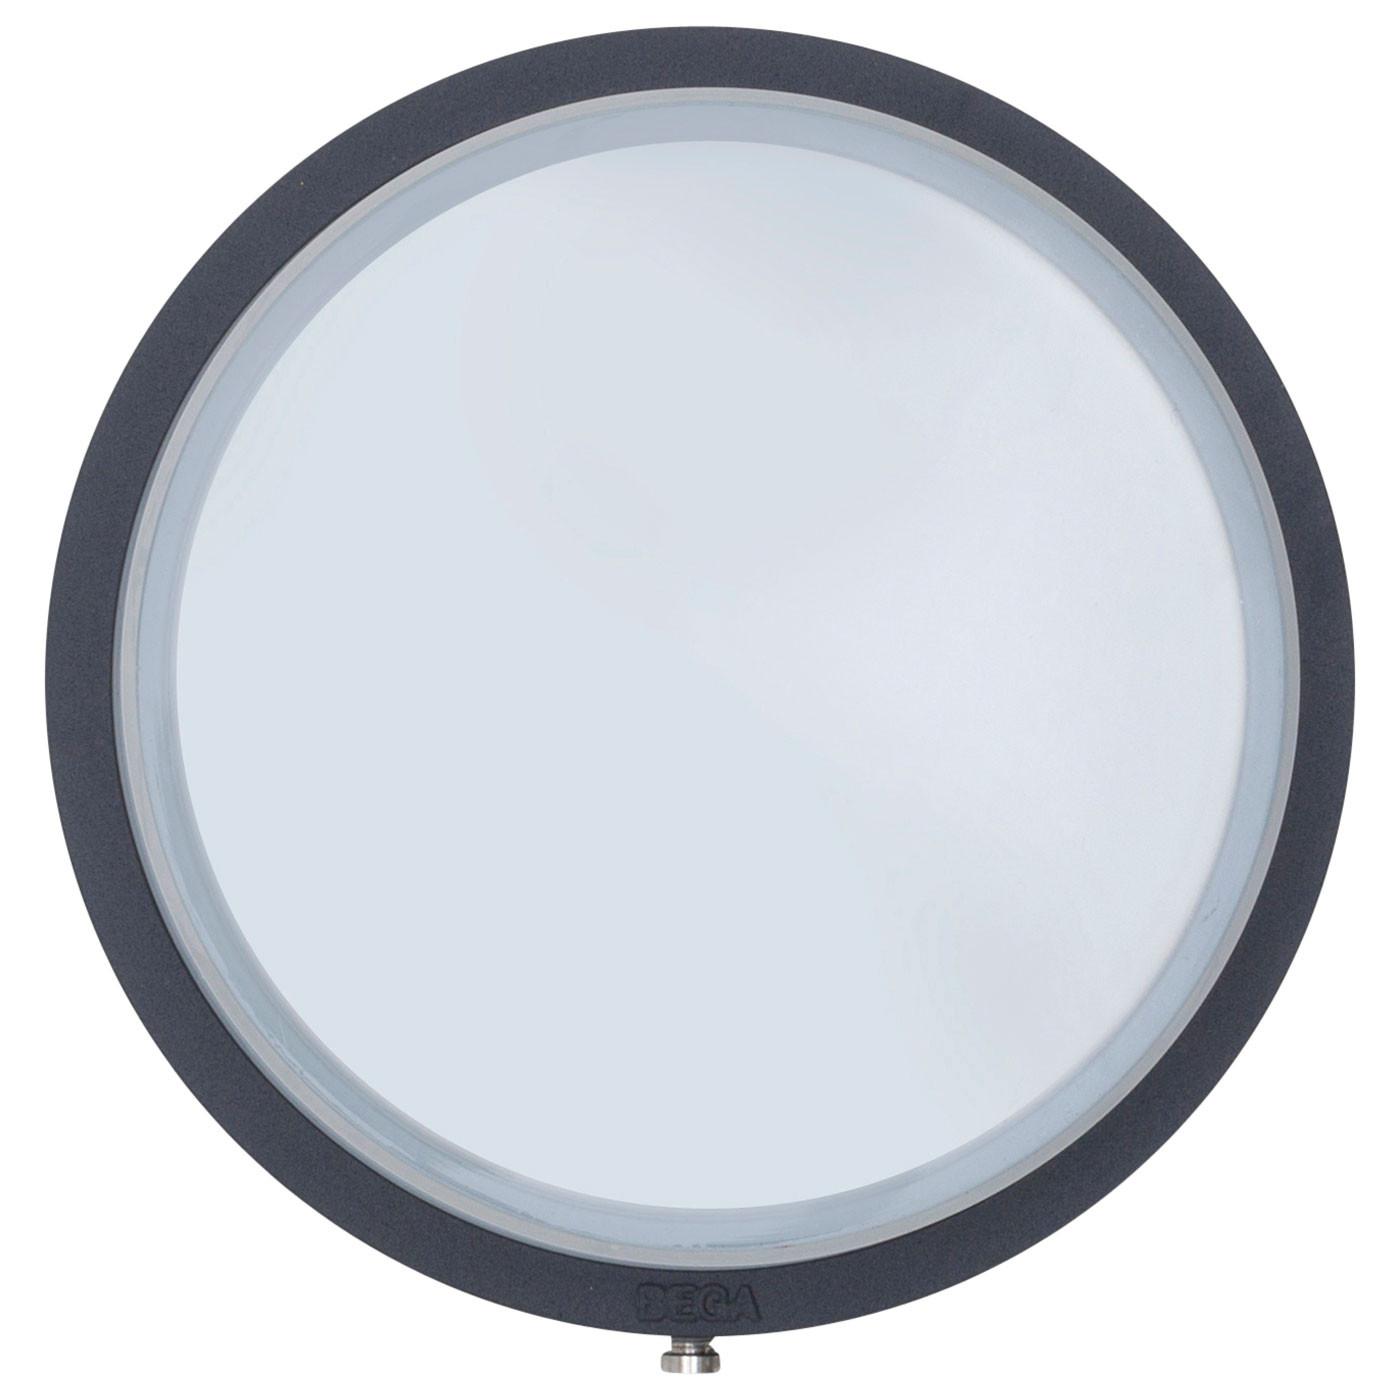 Bega 33523 LED Wand- oder Deckenleuchte